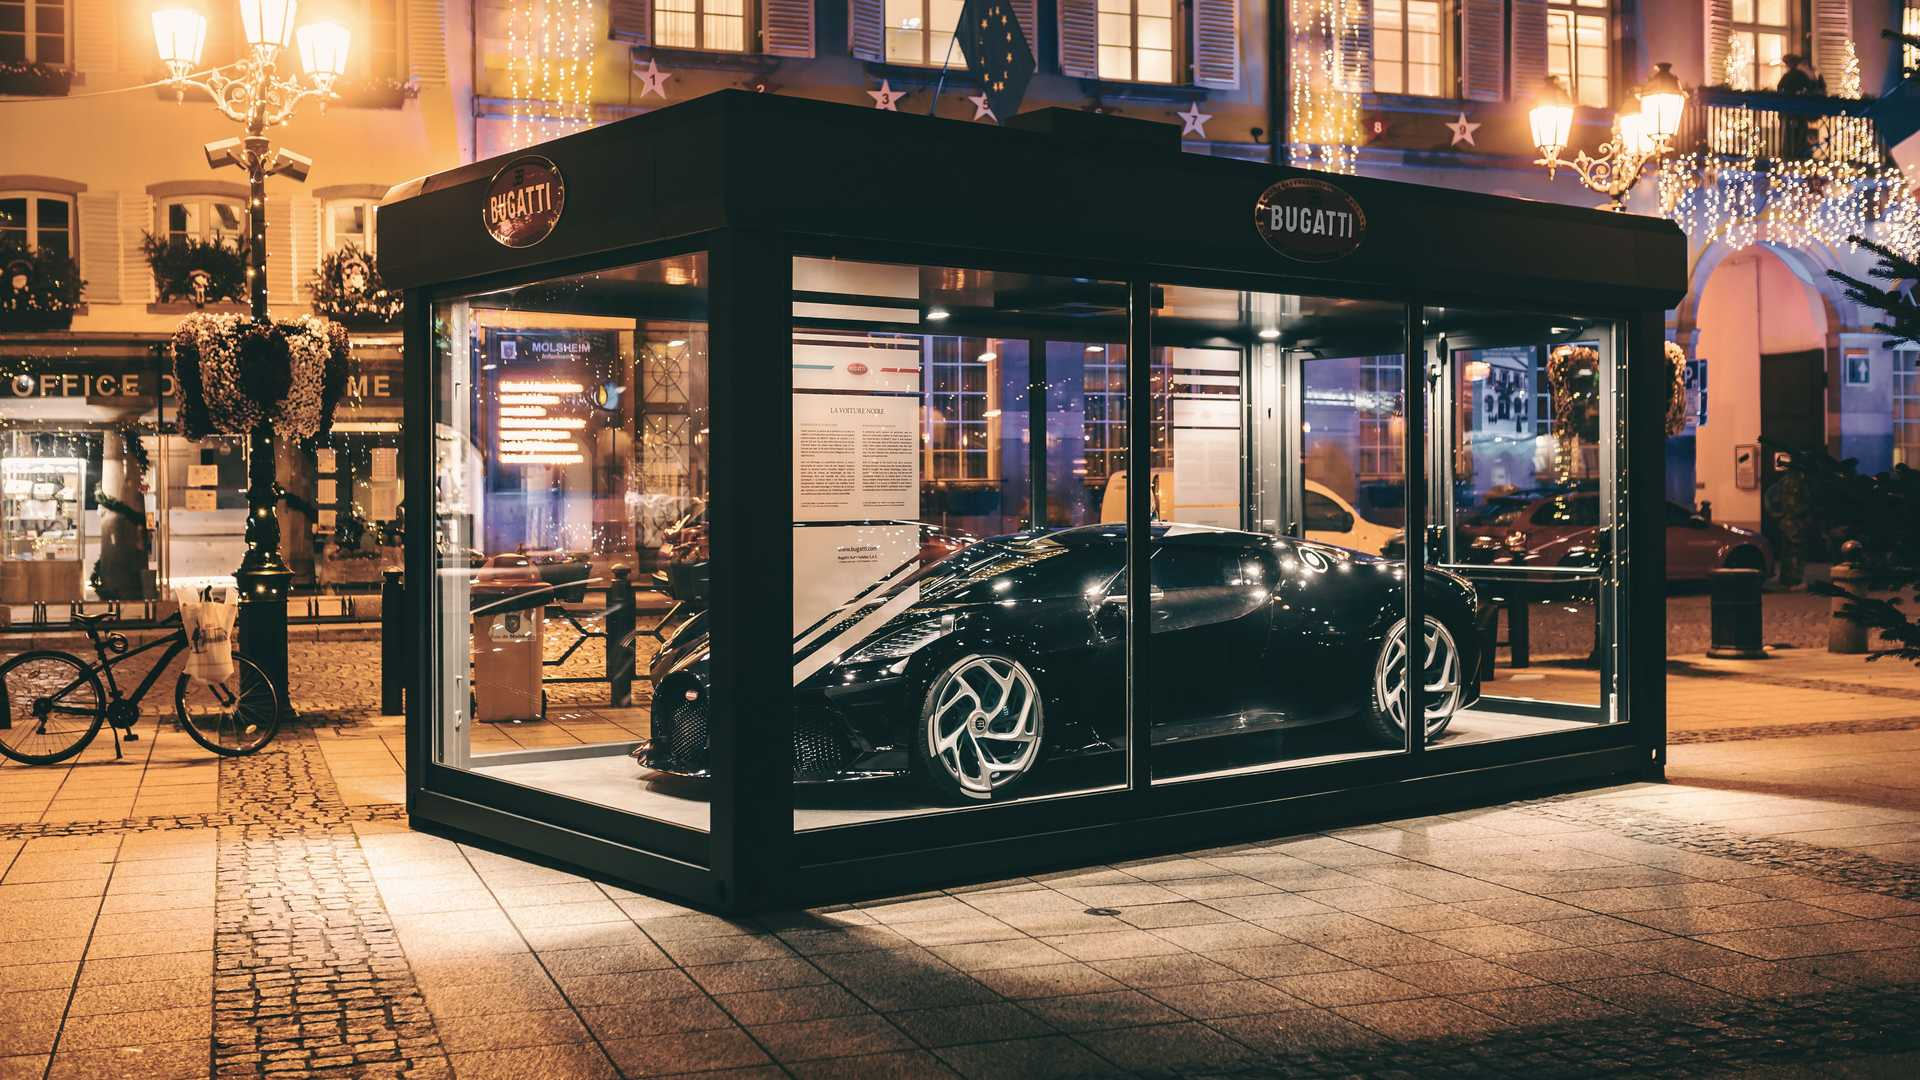 Bugatti: Ο ακριβότερος χριστουγεννιάτικος στολισμός στον κόσμο [pics]